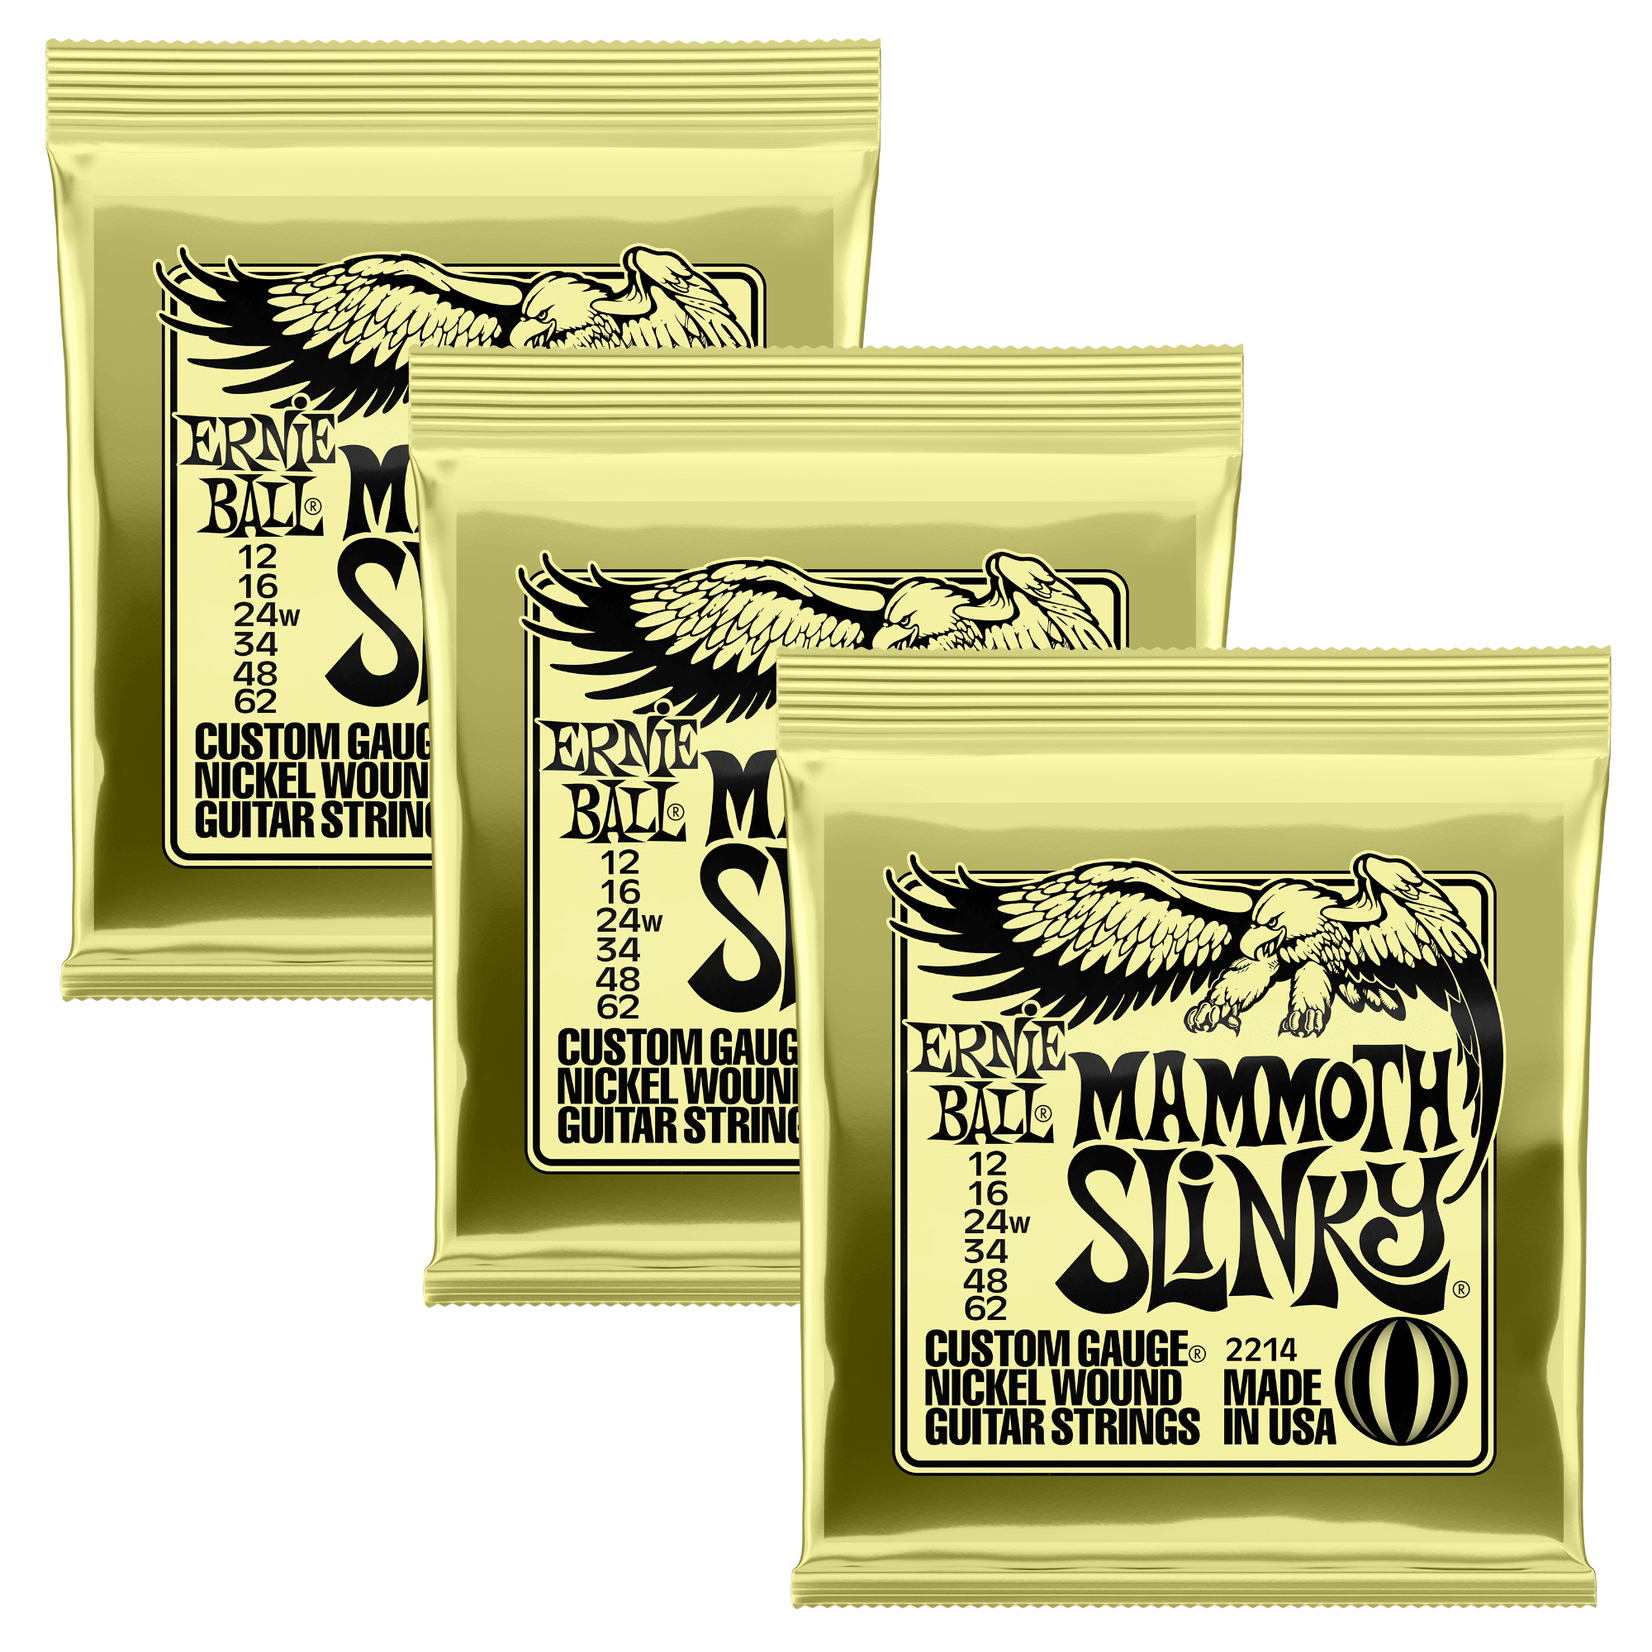 Ernie Ball 3x (3 sets) Ernie Ball Mammoth Slinky Custom Gauge Nickel Wound Electric Guitar Strings (12-62)